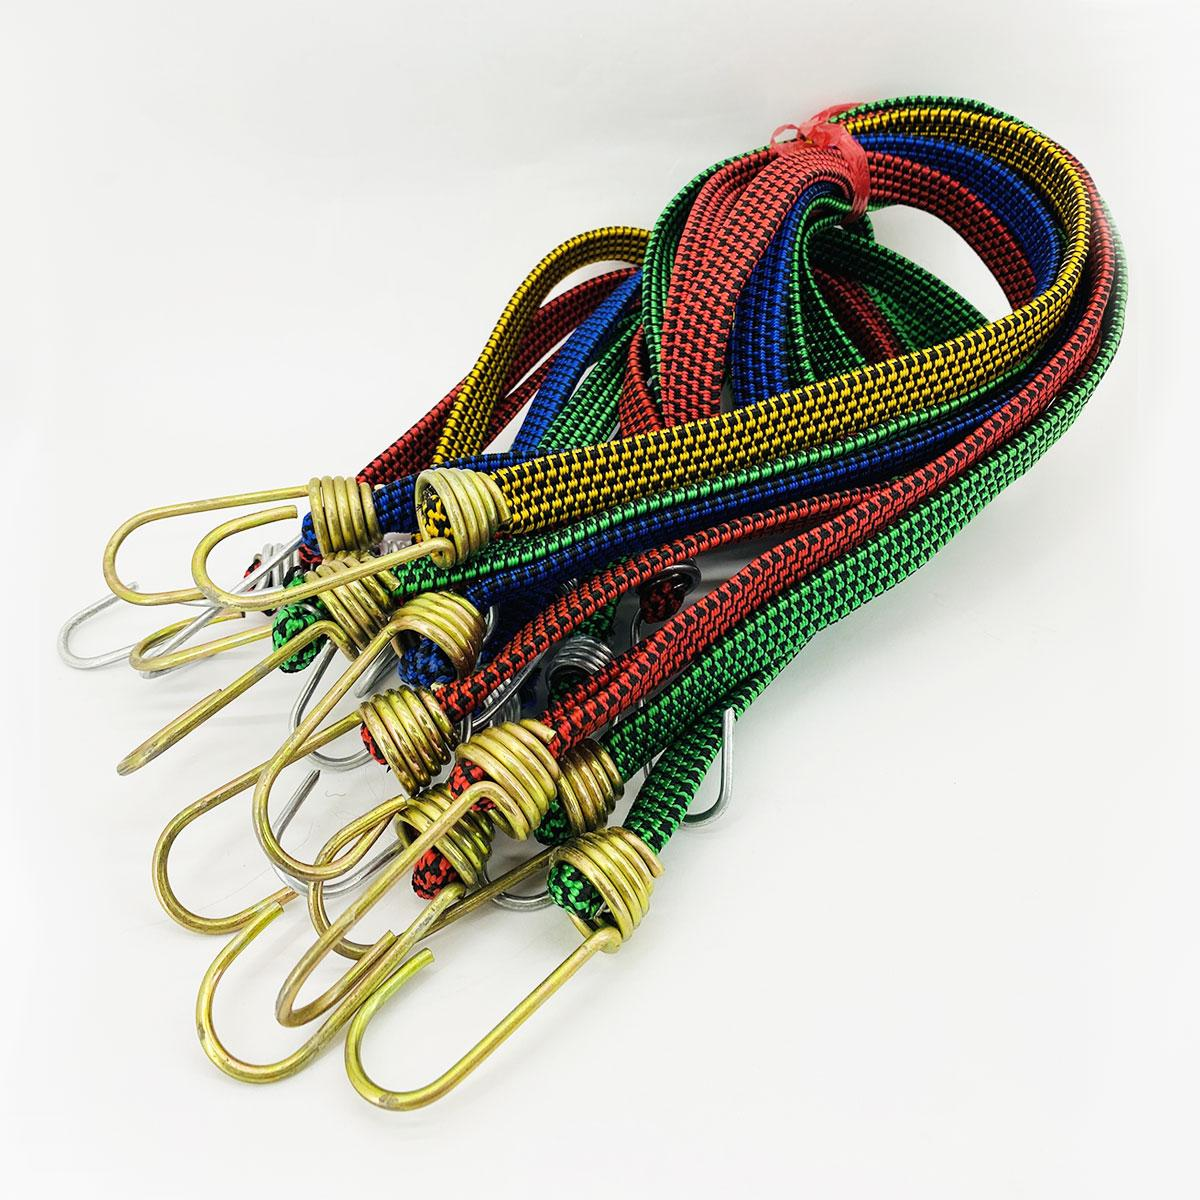 Резинка багажная с крючками  2 м х 20 мм (10 шт/упак) цветная плоская